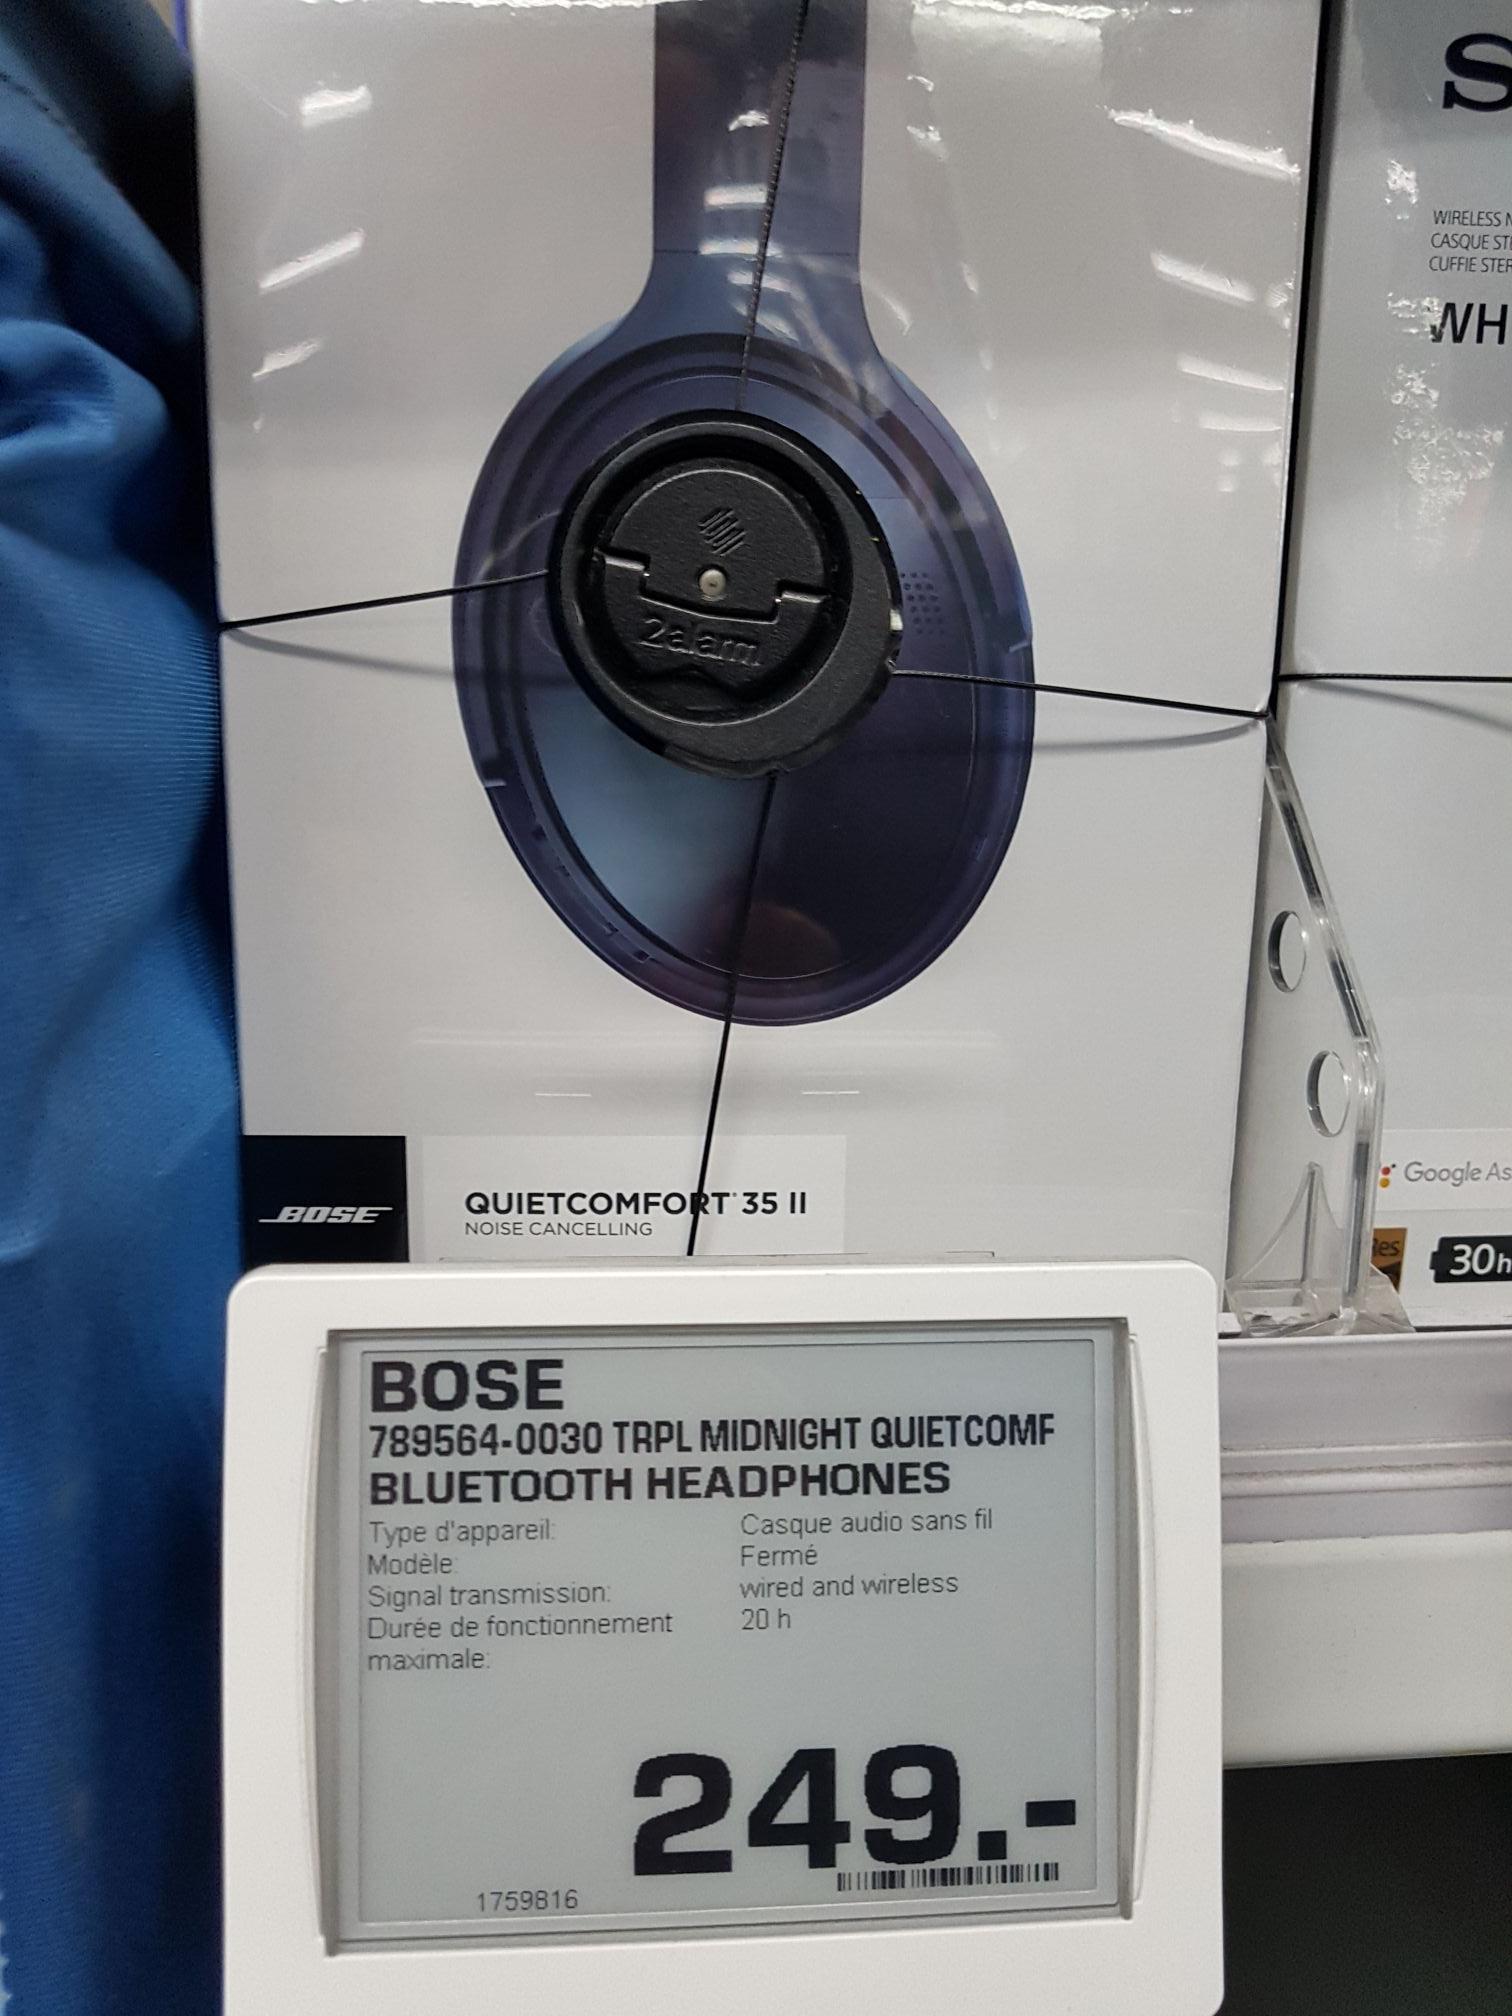 casque bluetooth bose quietcomfort 35 ii qc35 v2. Black Bedroom Furniture Sets. Home Design Ideas